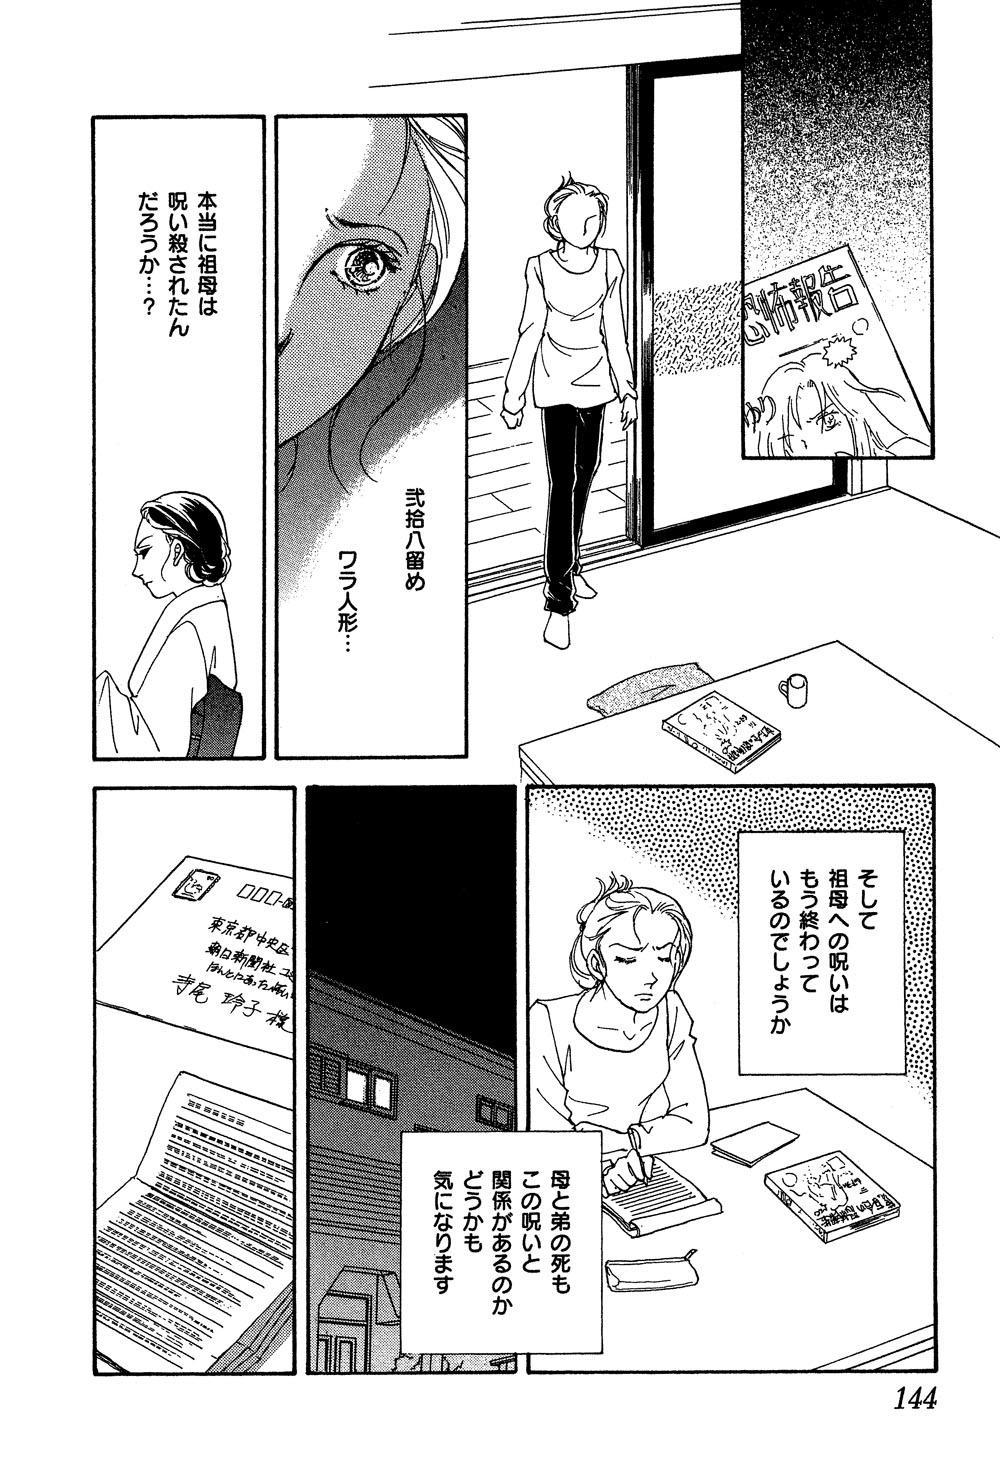 mayuri_0001_0144.jpg